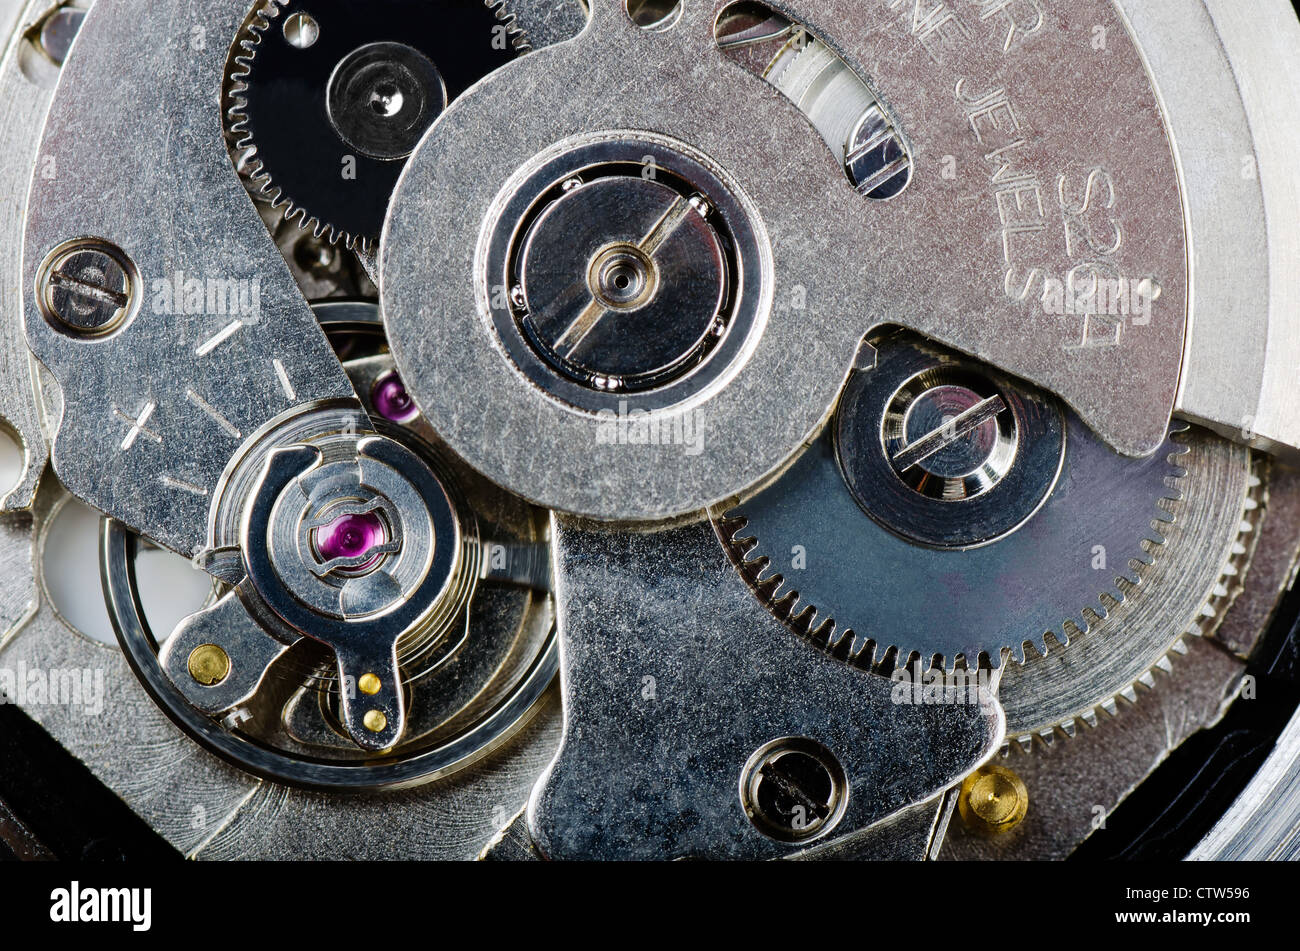 Macro shot of mechanism of wrist watch - Stock Image